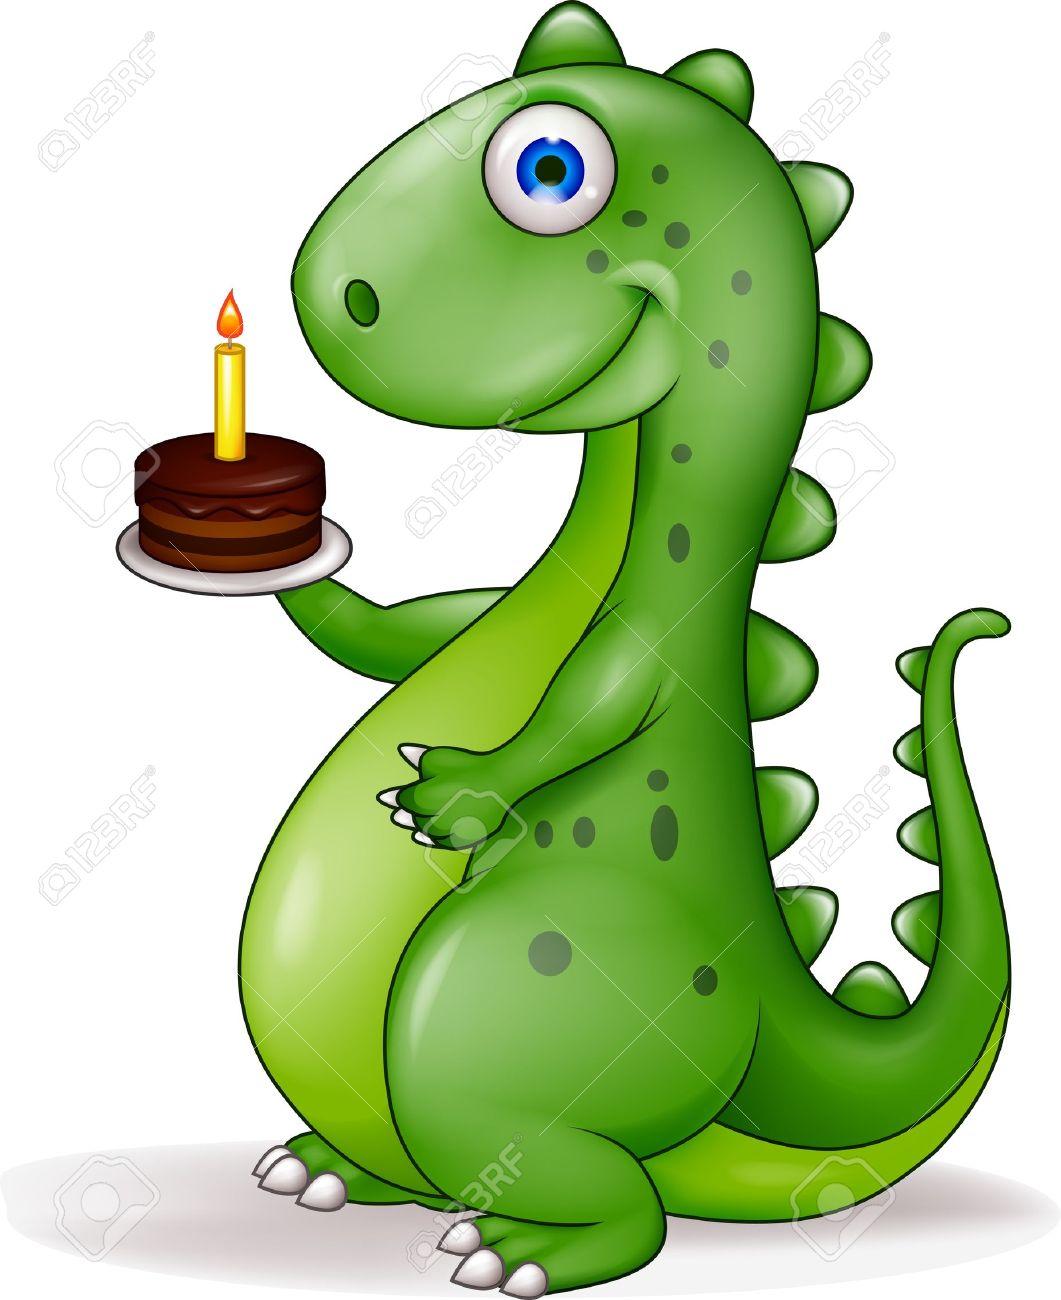 Funny Dinosaur With Birthday Cake Royalty Free Cliparts Vectors